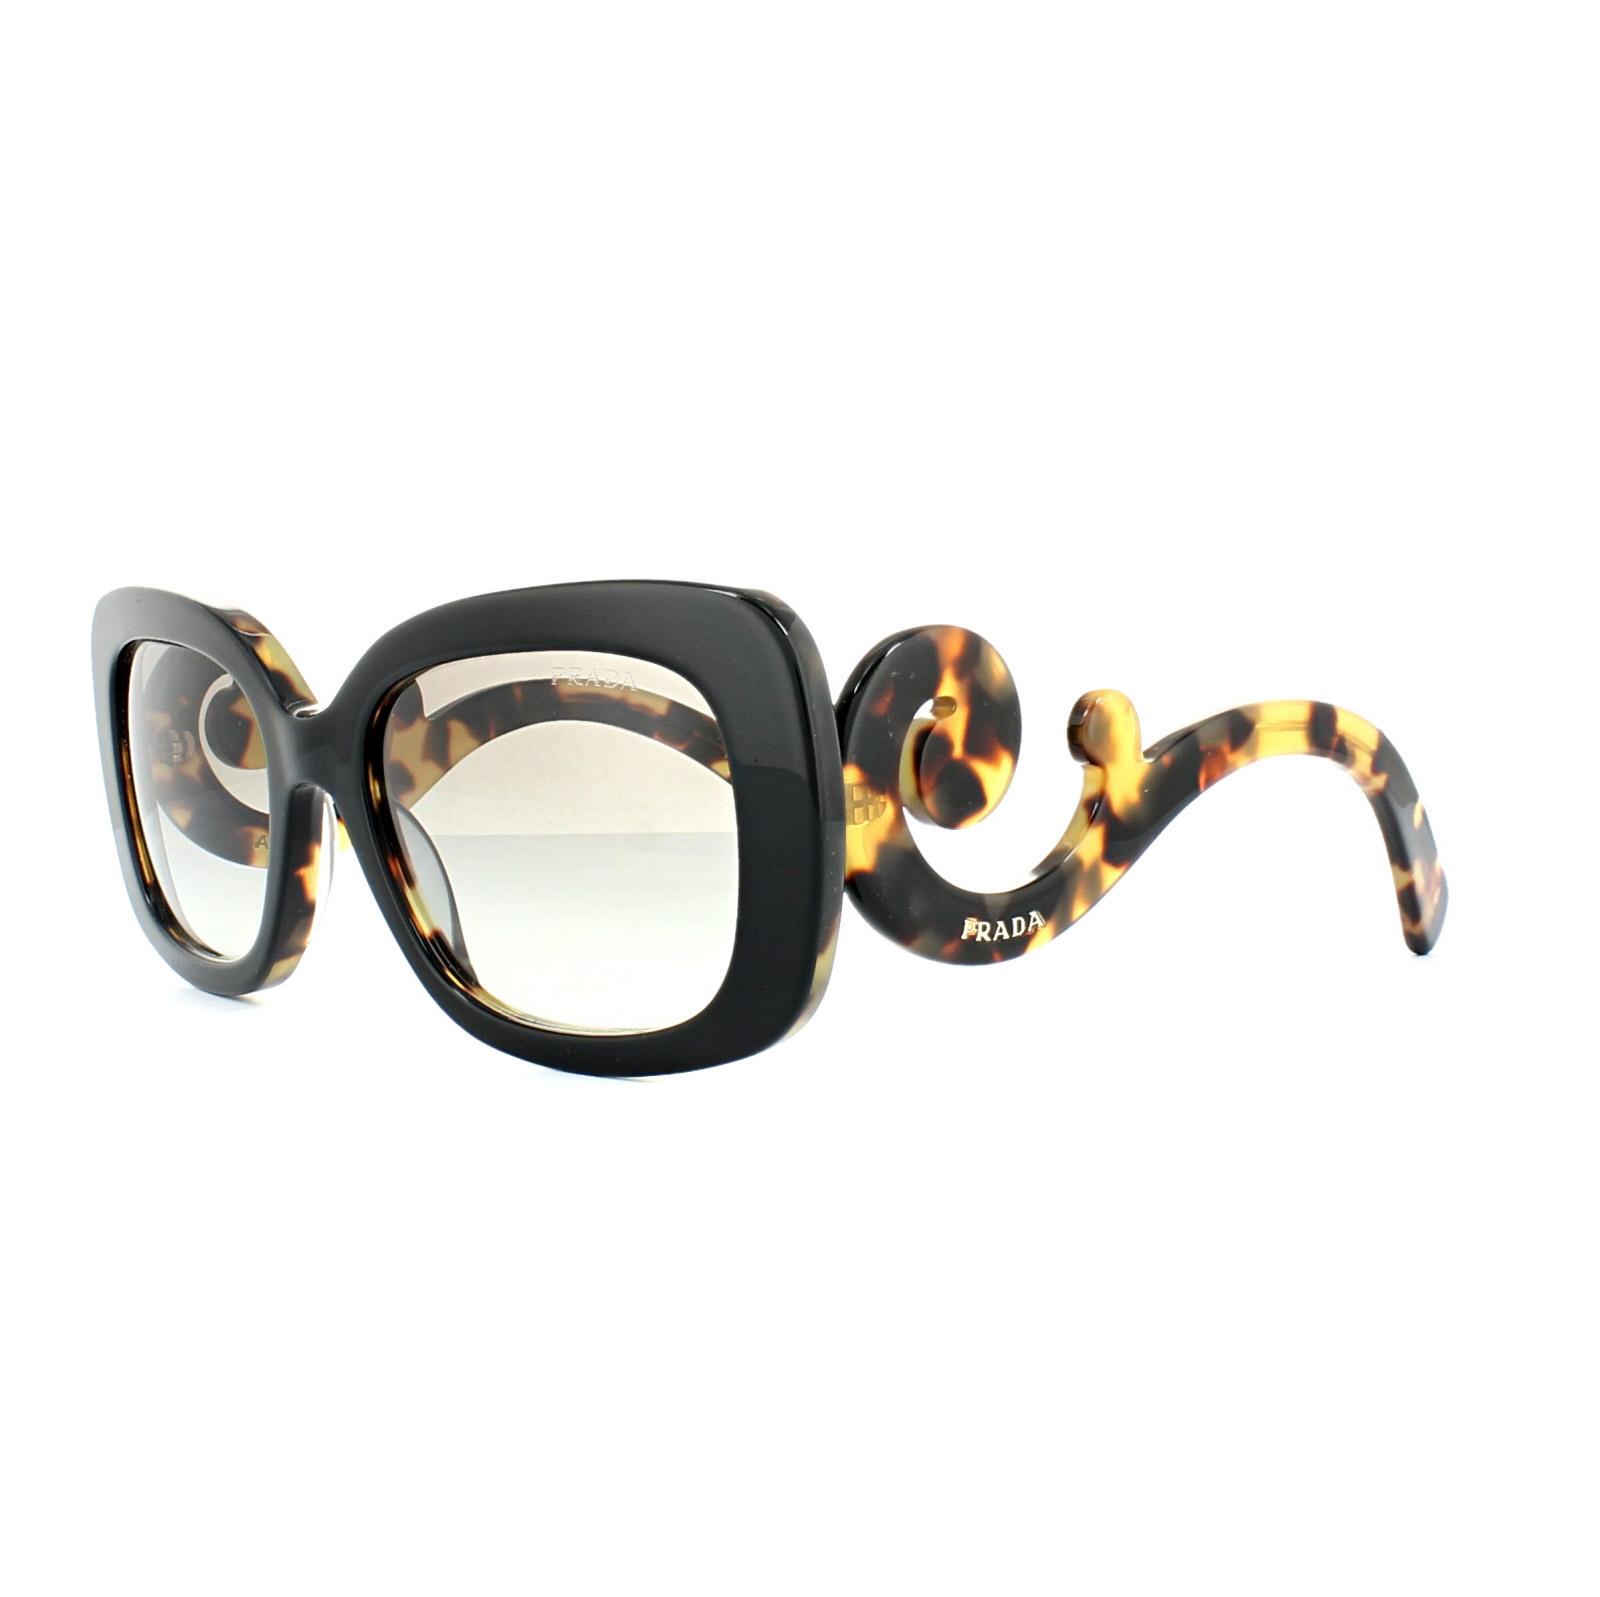 fdf08ee6b ... baroque sunglasses prada pr 4d7ee 78775; get sentinel prada sunglasses  27os nai0a7 black blonde havana grey gradient 5a180 10f55